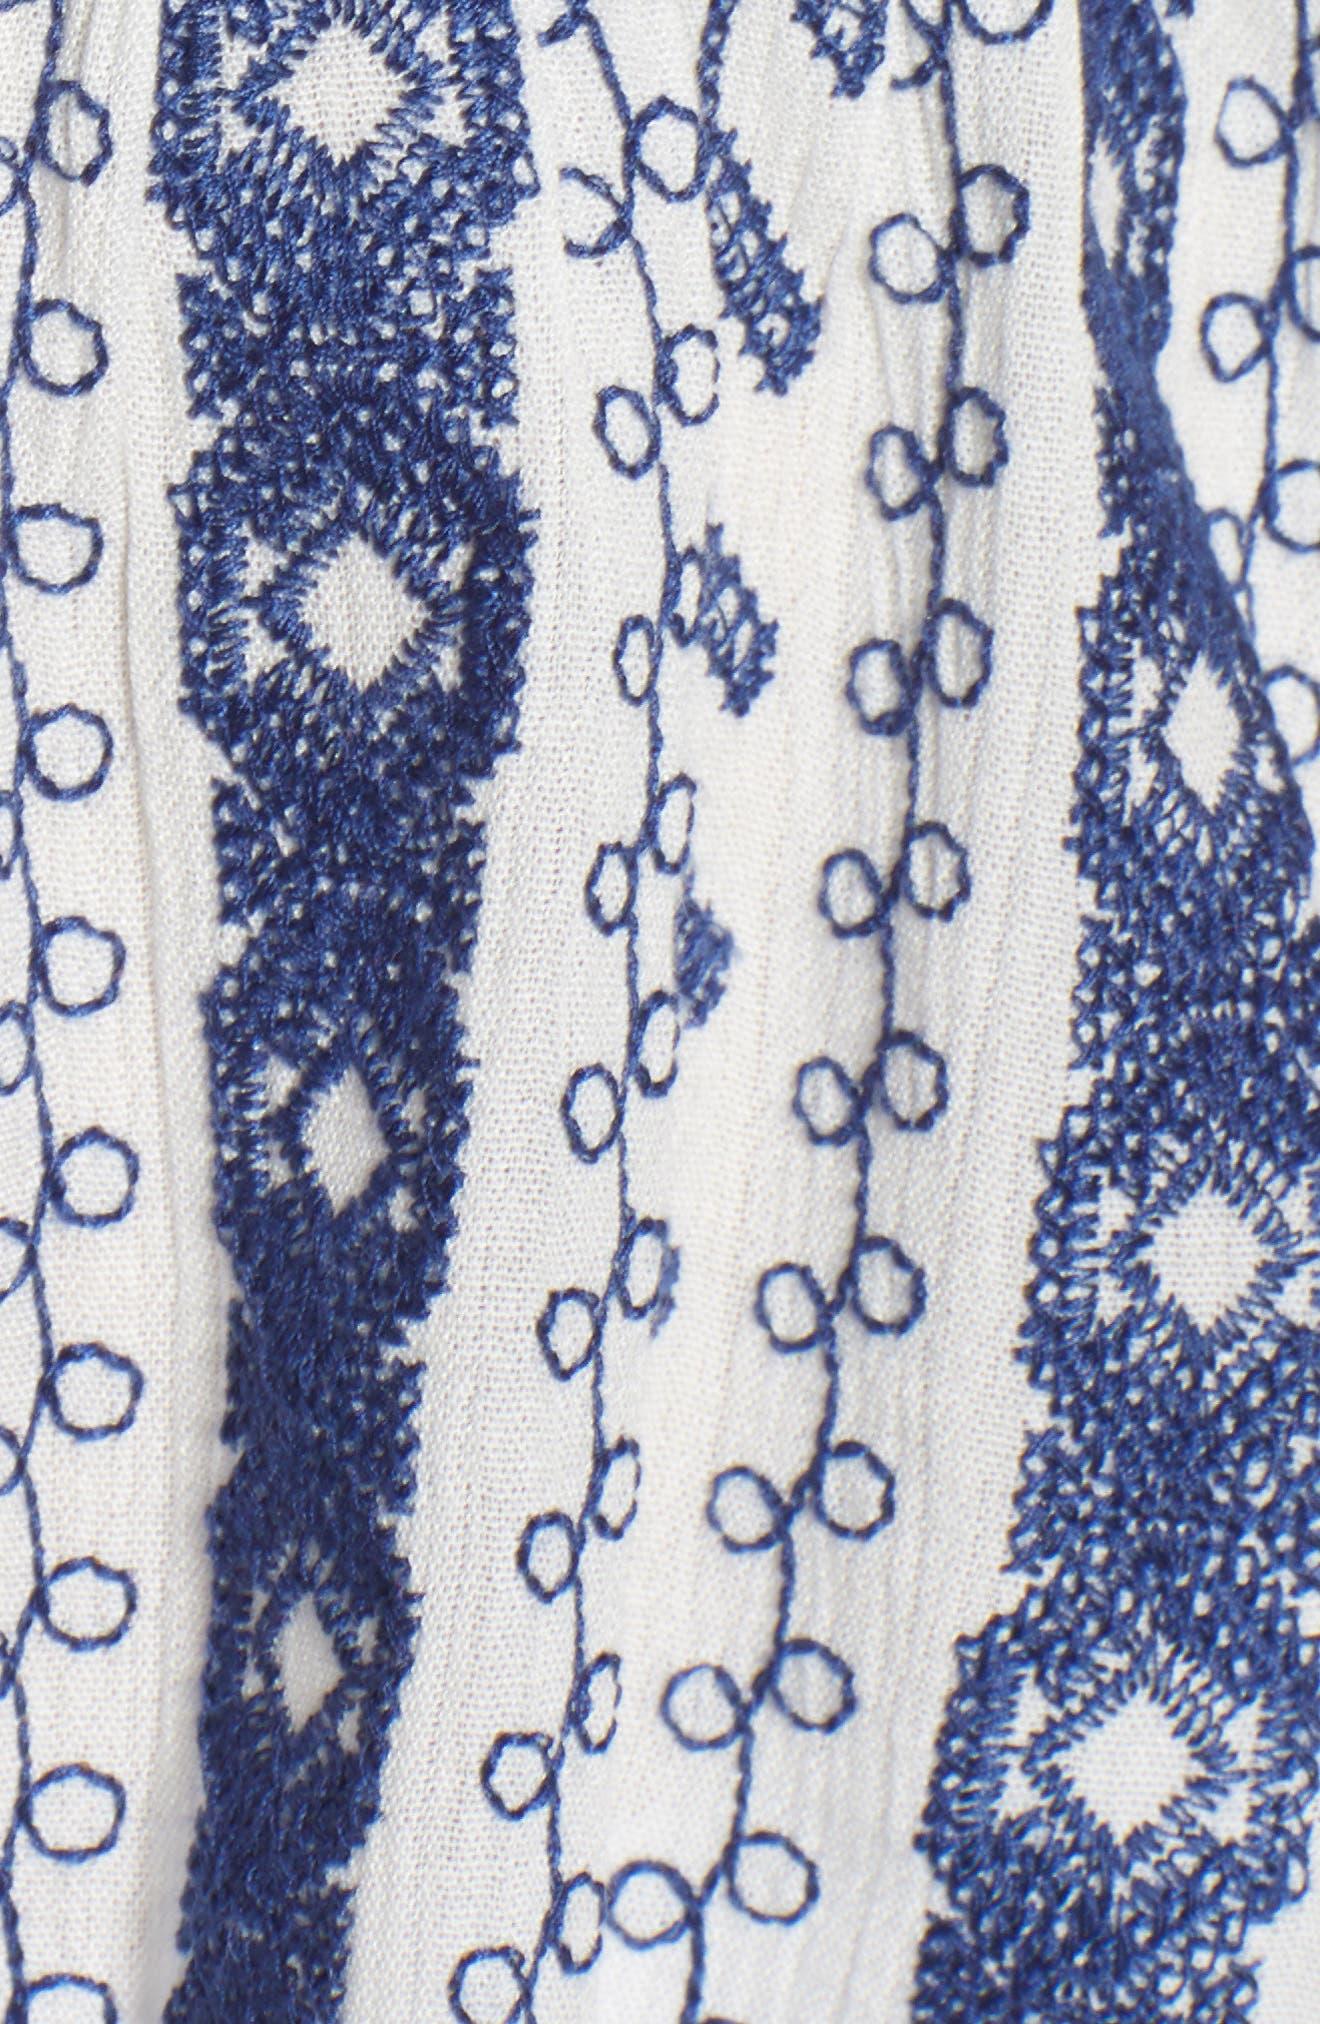 Blinda Embroidered Gauze Peplum Top,                             Alternate thumbnail 6, color,                             Ivory